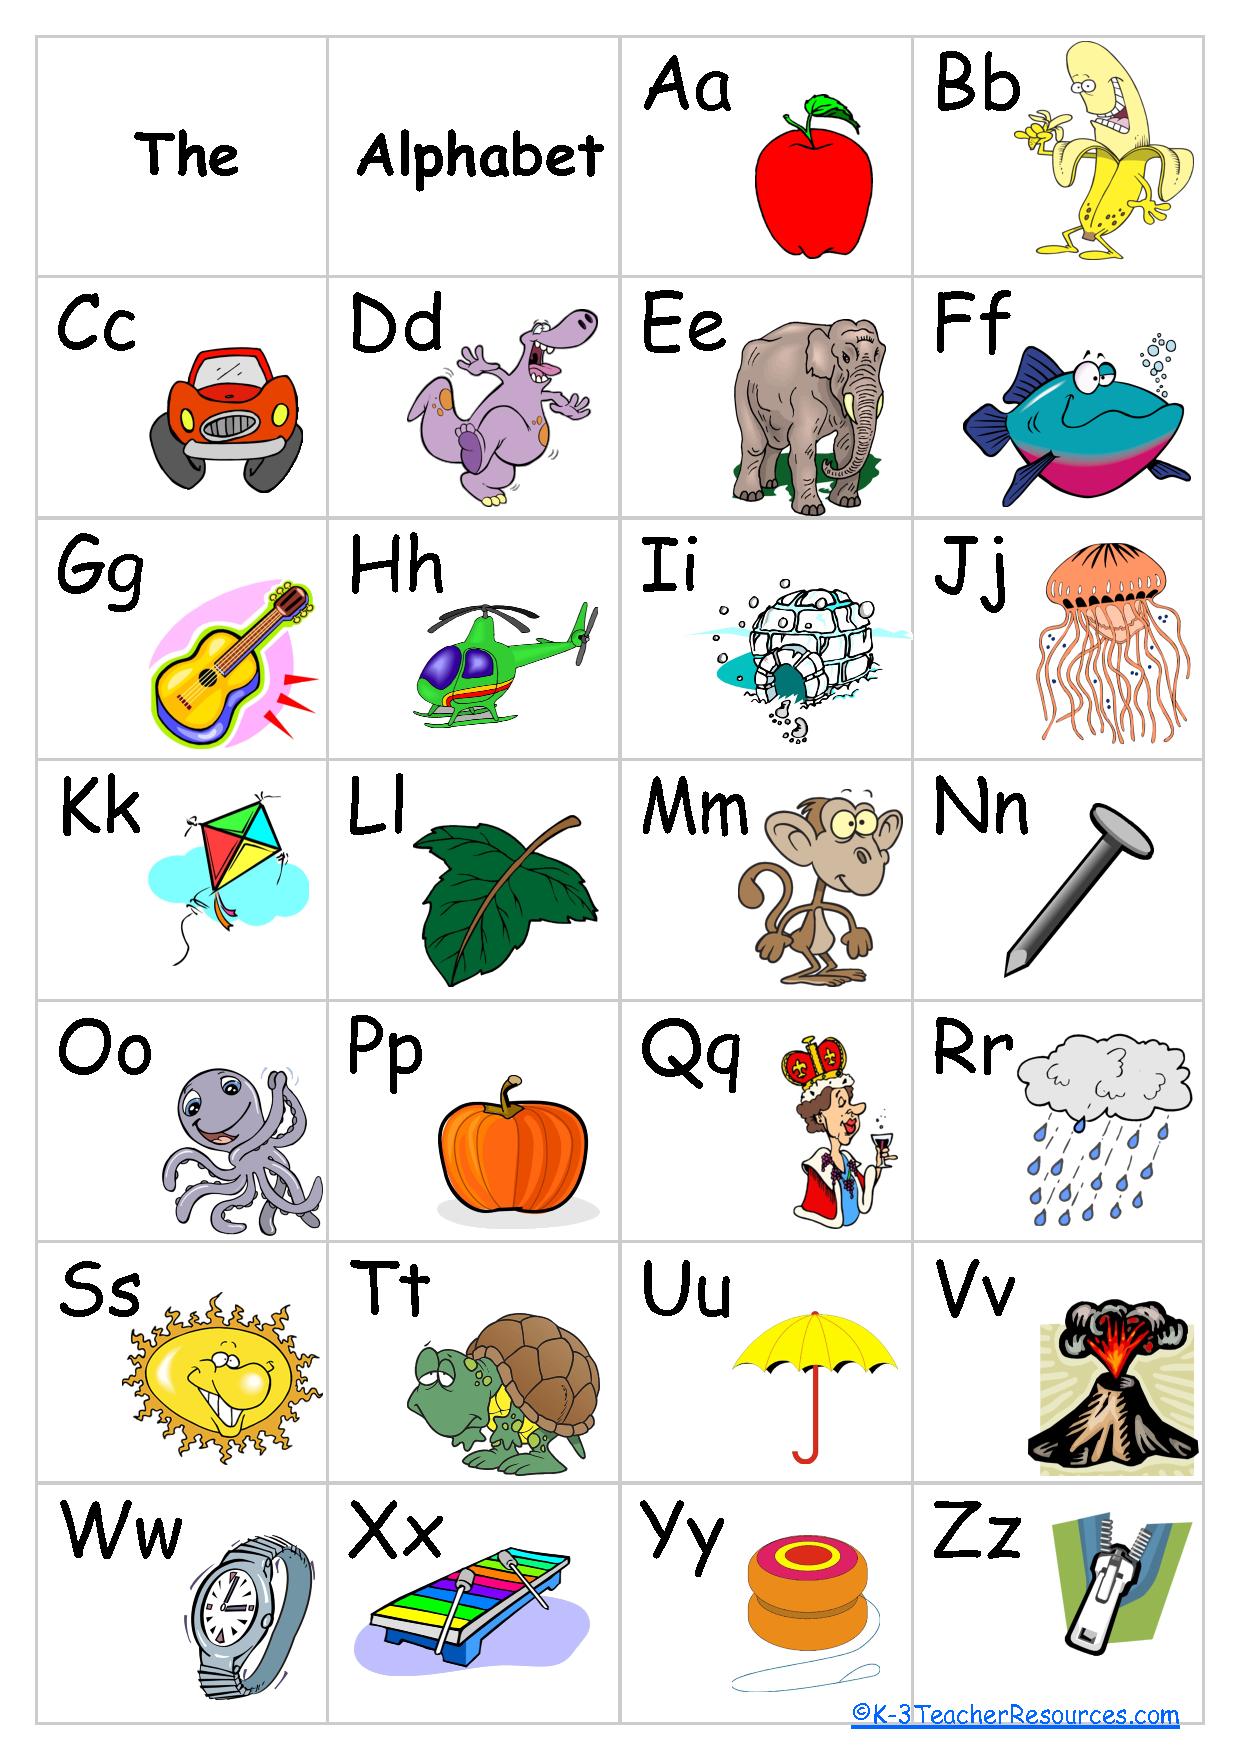 Free+Printable+Alphabet+Chart   Schoolroom Ideas   Pinterest - Free Printable Alphabet Chart